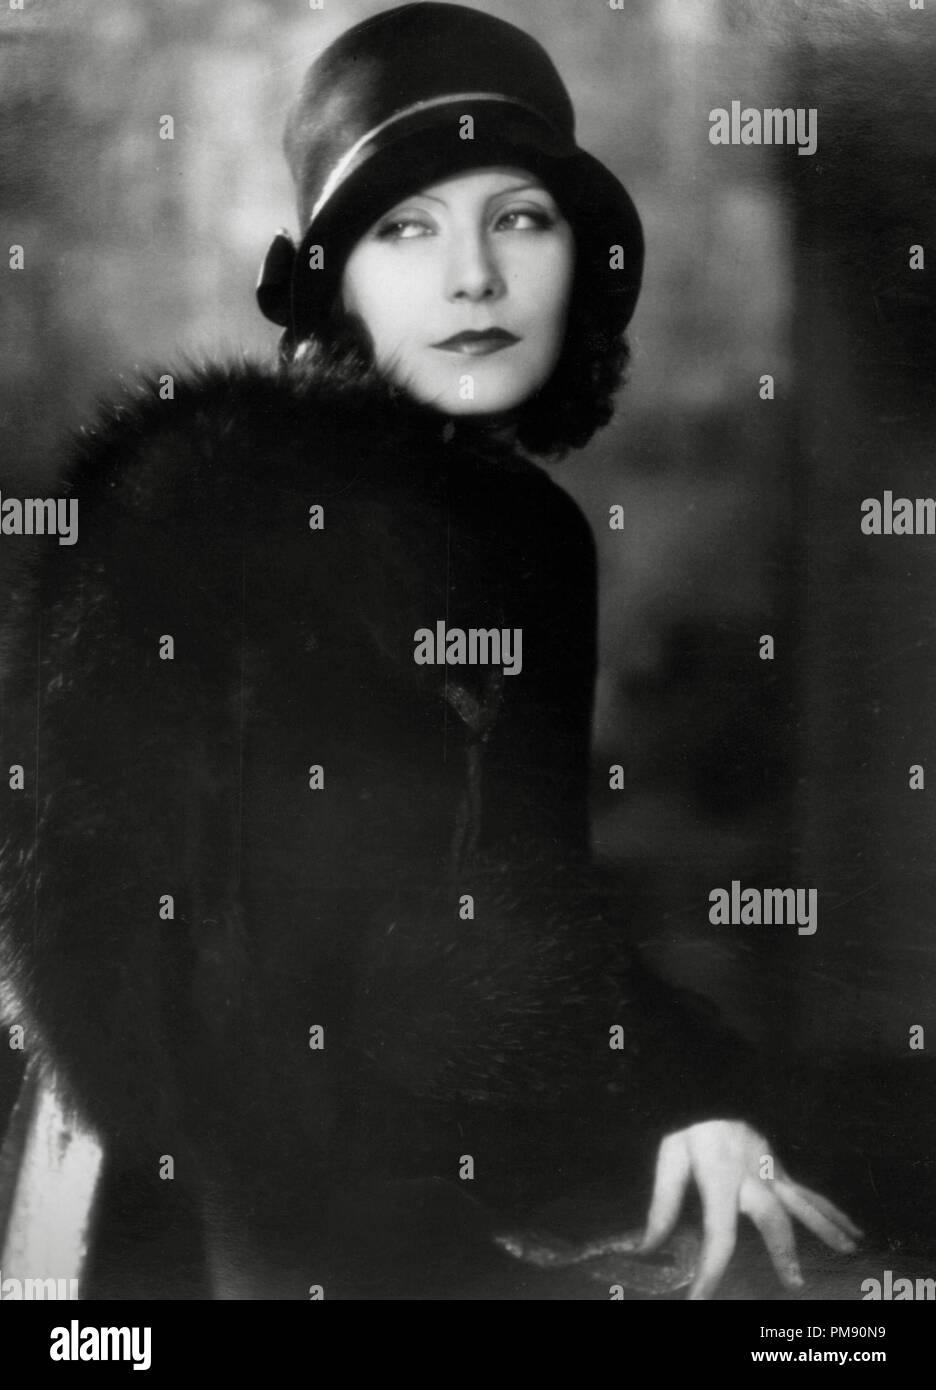 (Archival Classic Cinema - Greta Garbo Retrospective) Greta Garbo, circa 1927  File Reference # 31523_033THA - Stock Image